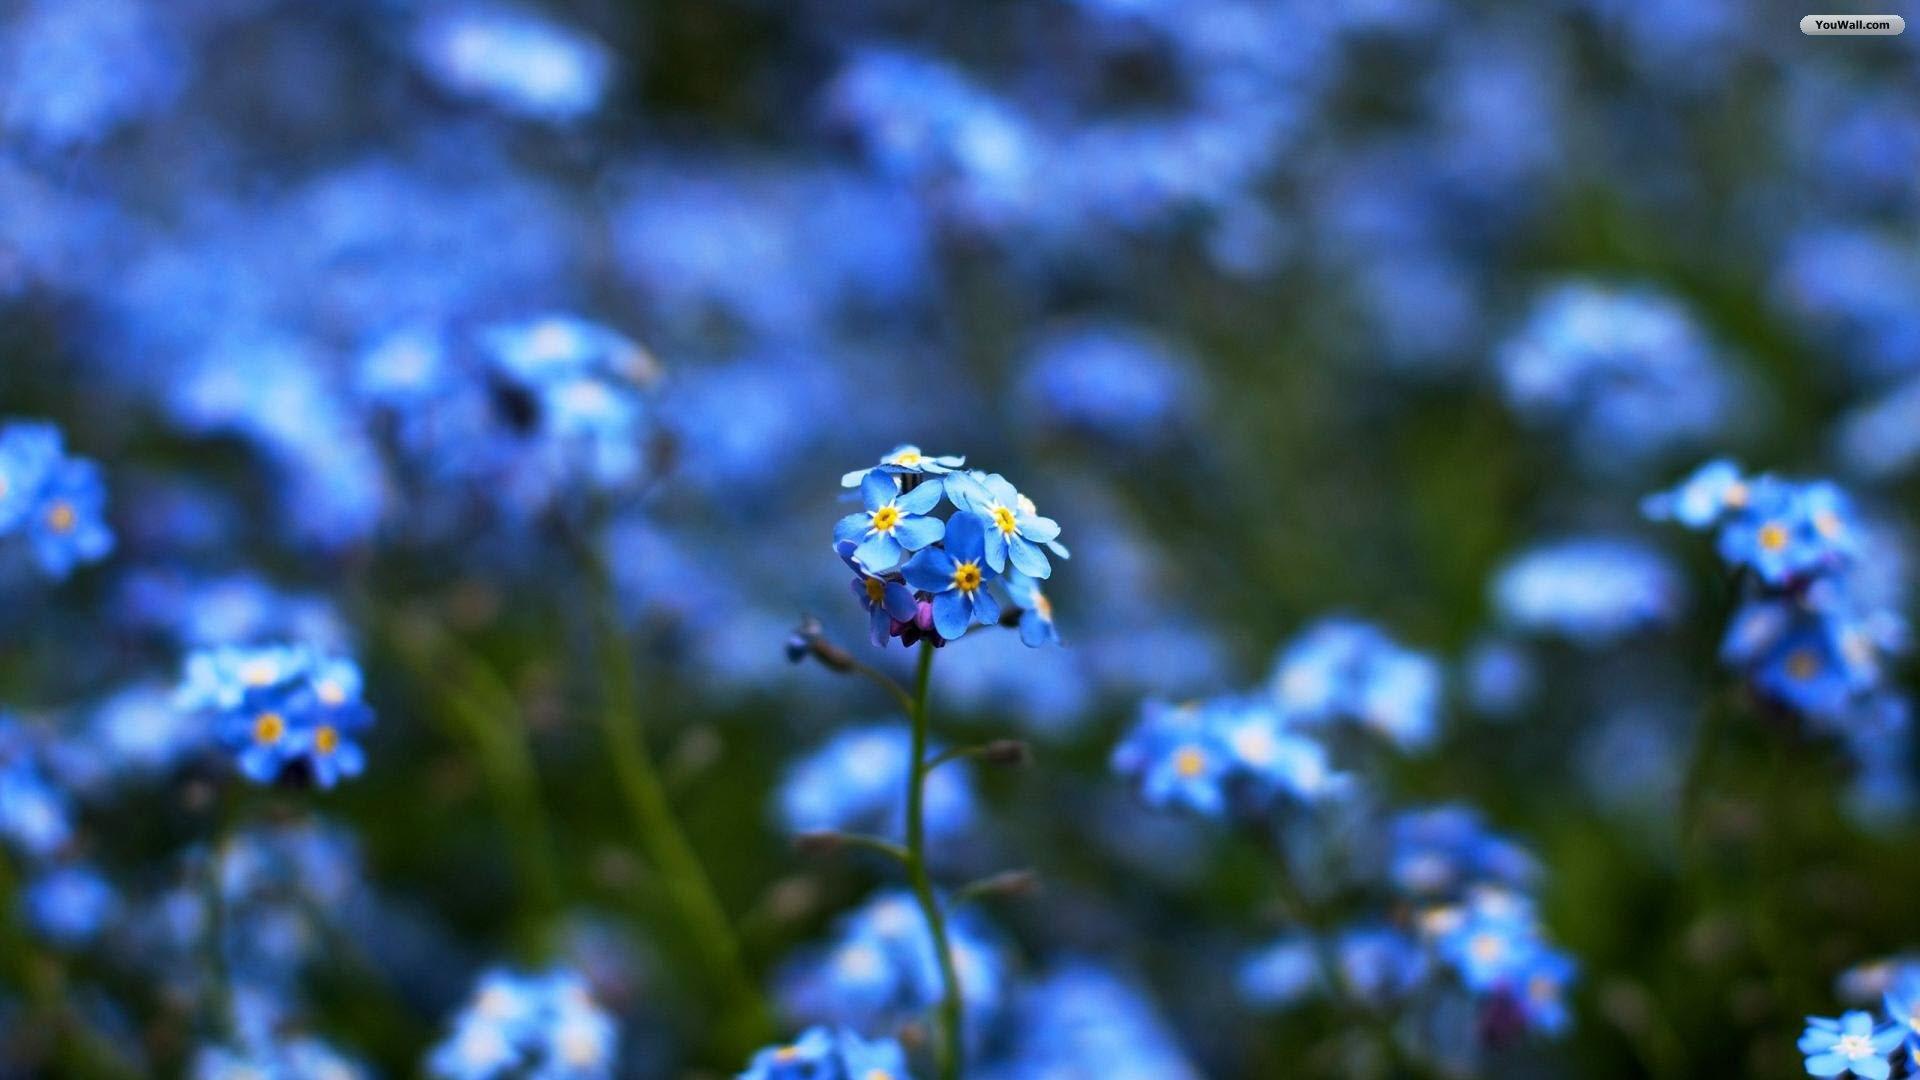 74 Blue Flowers Wallpaper On Wallpapersafari